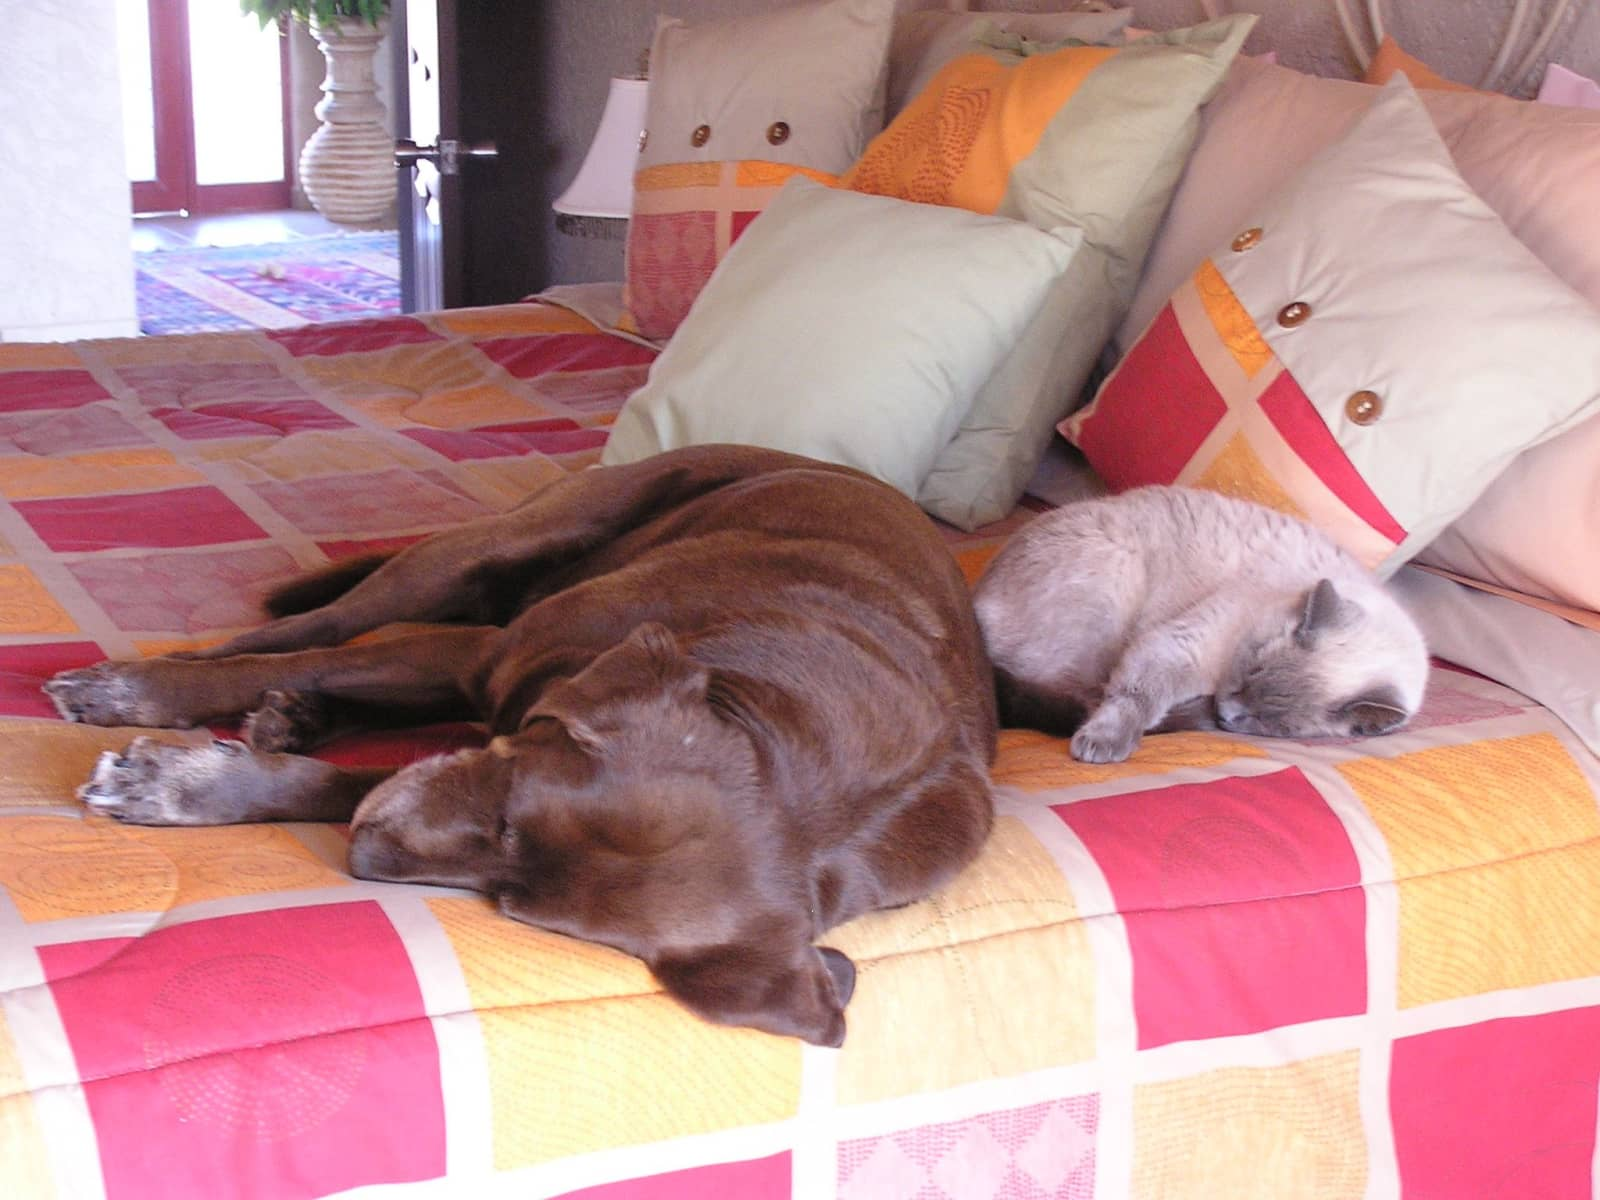 John & carole & Carole ann from Ajijic, Mexico